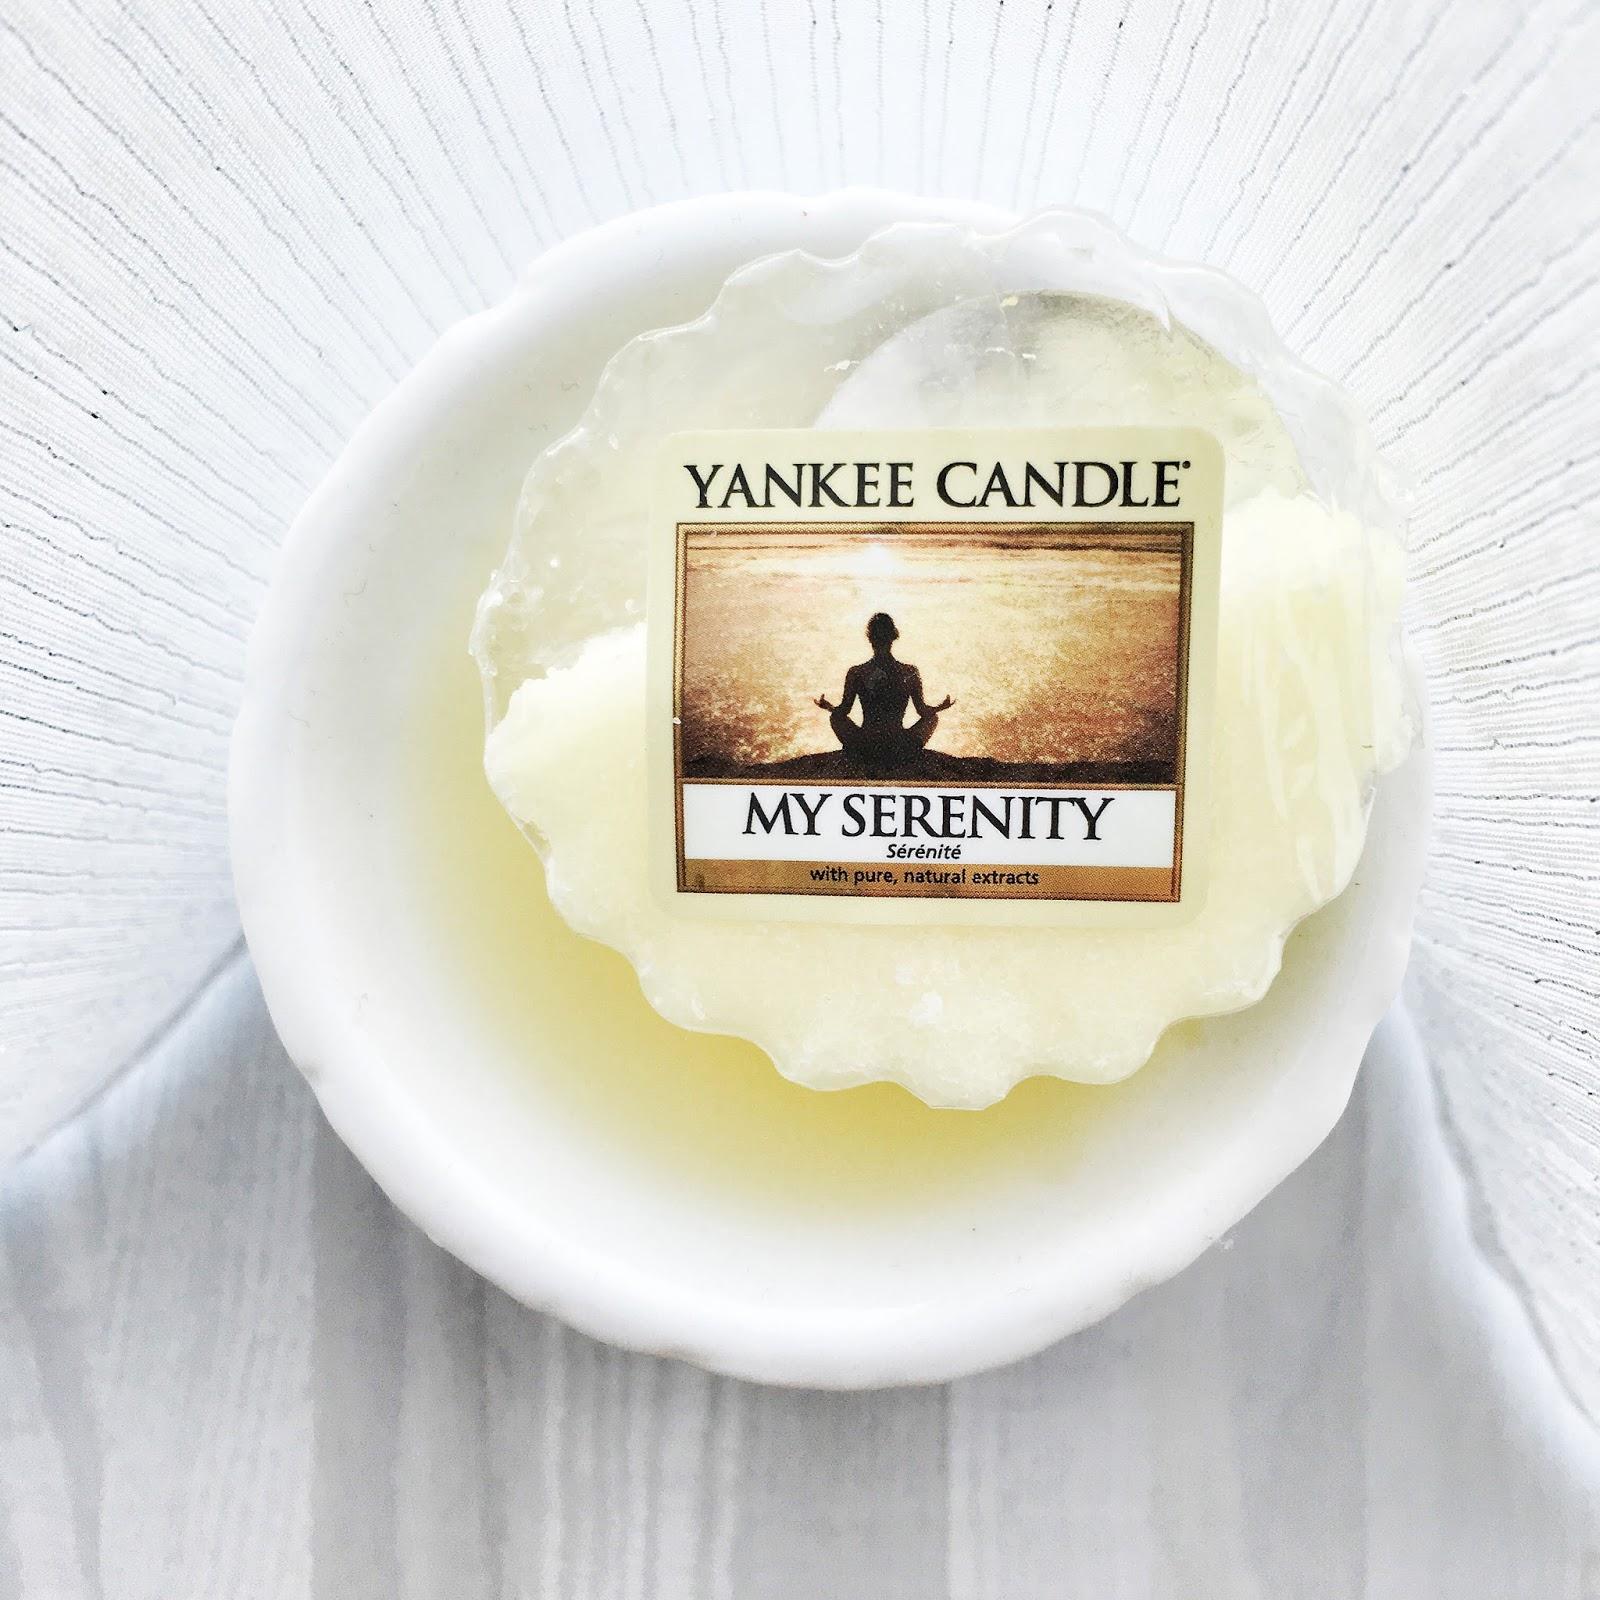 My Serenity